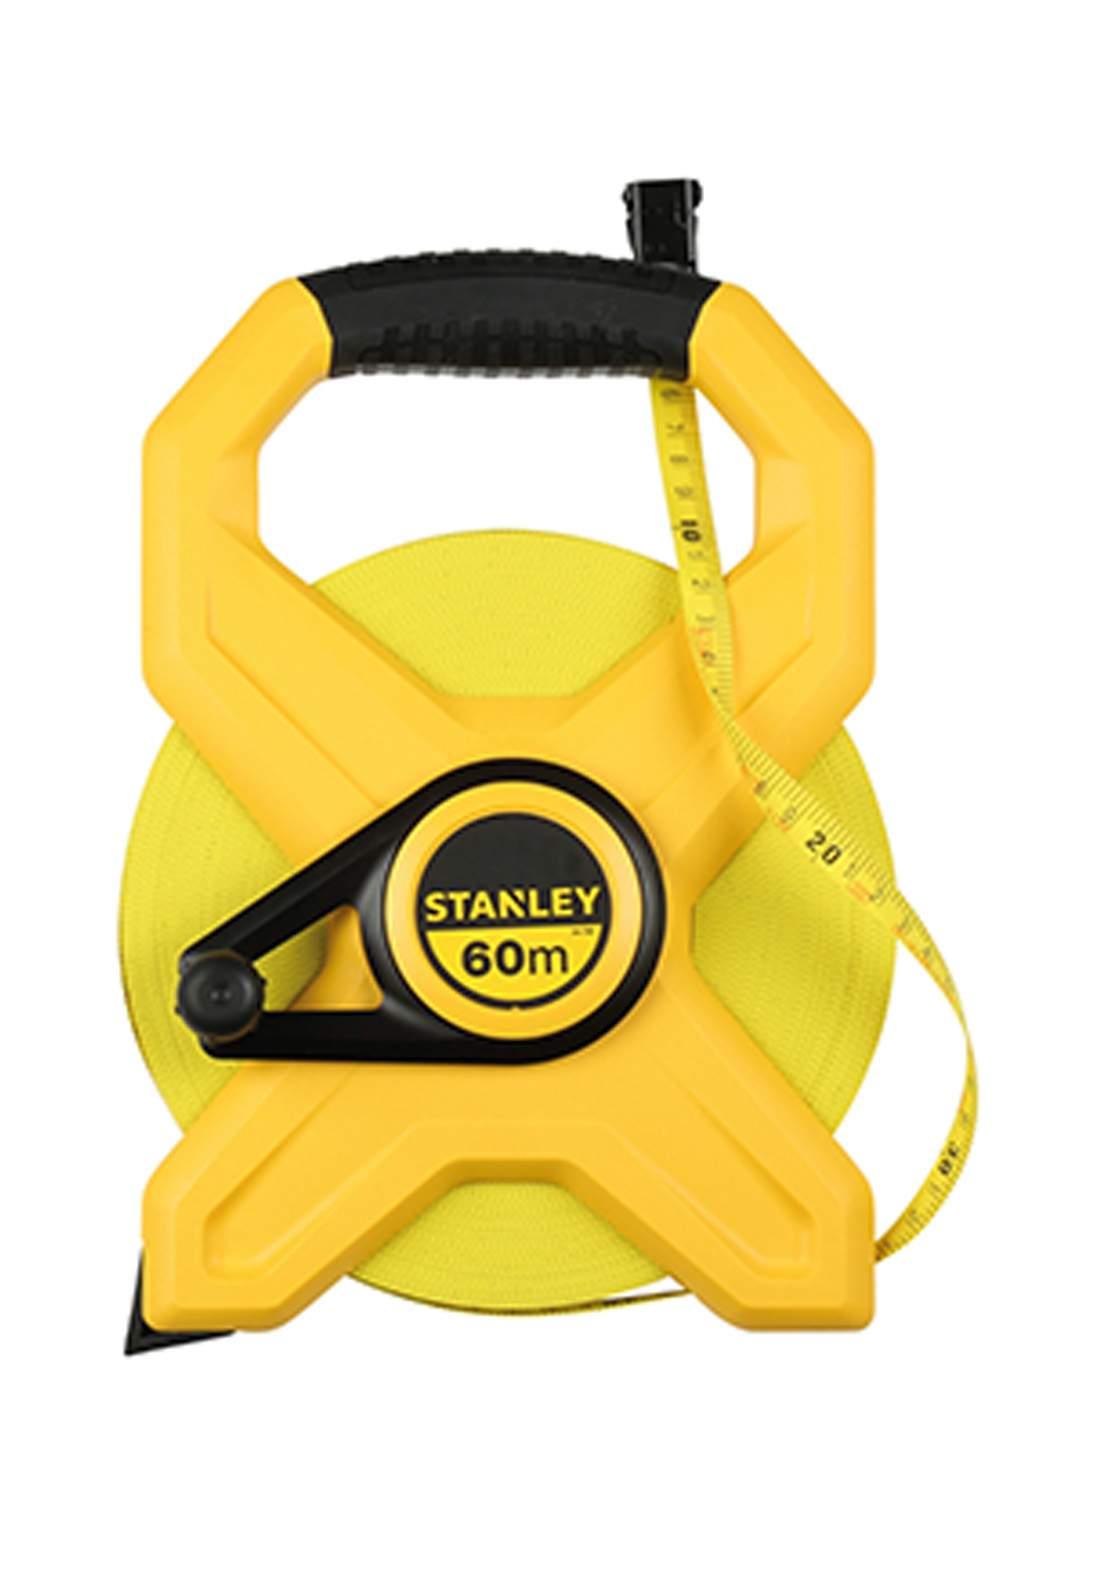 Stanley STHT34795-8 Measuring Tape 60m شريط قياس